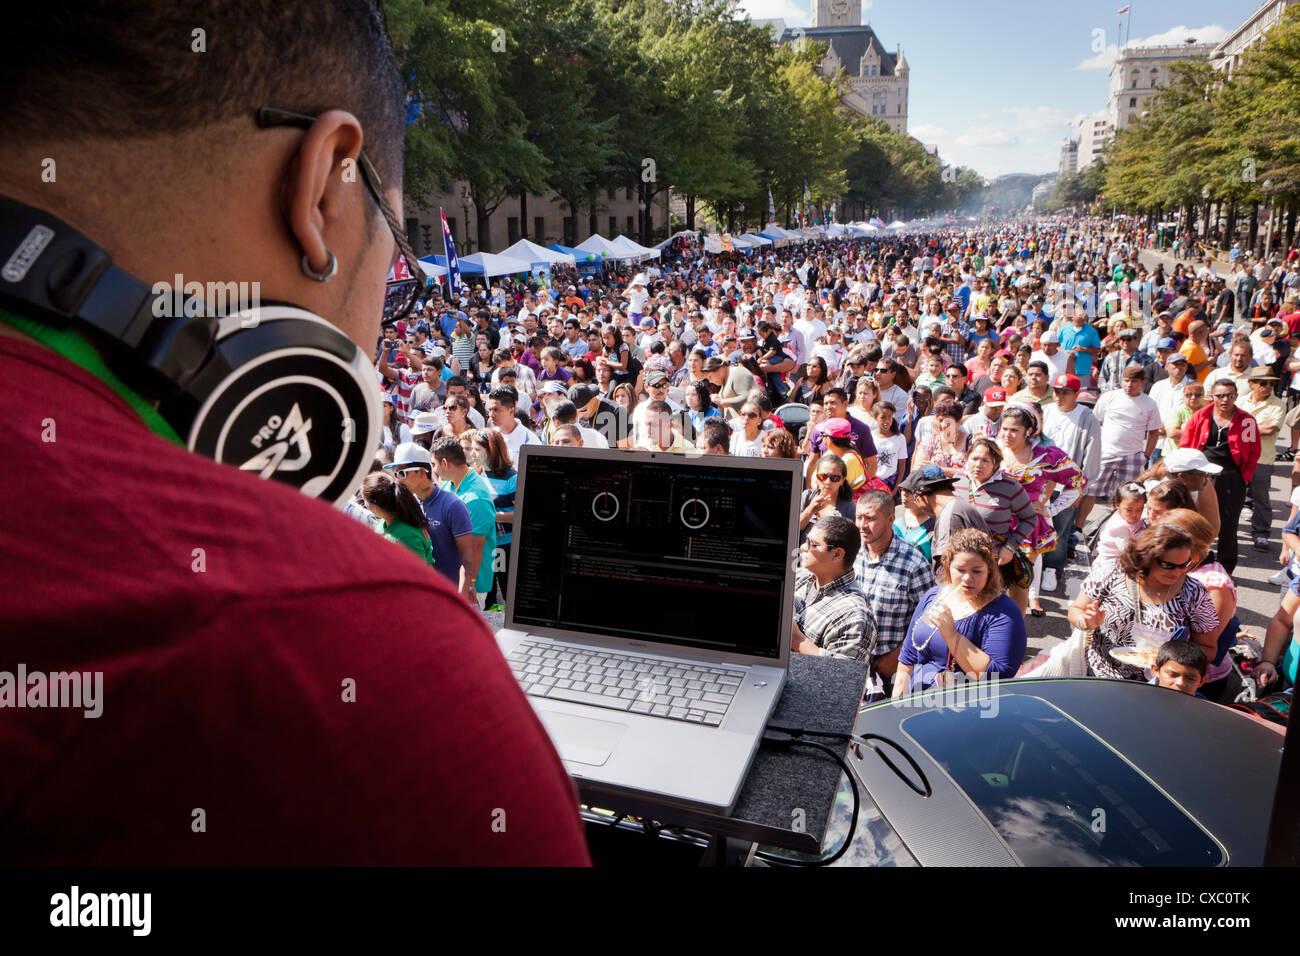 DJ playing music at an outdoor concert - USA Stock Photo